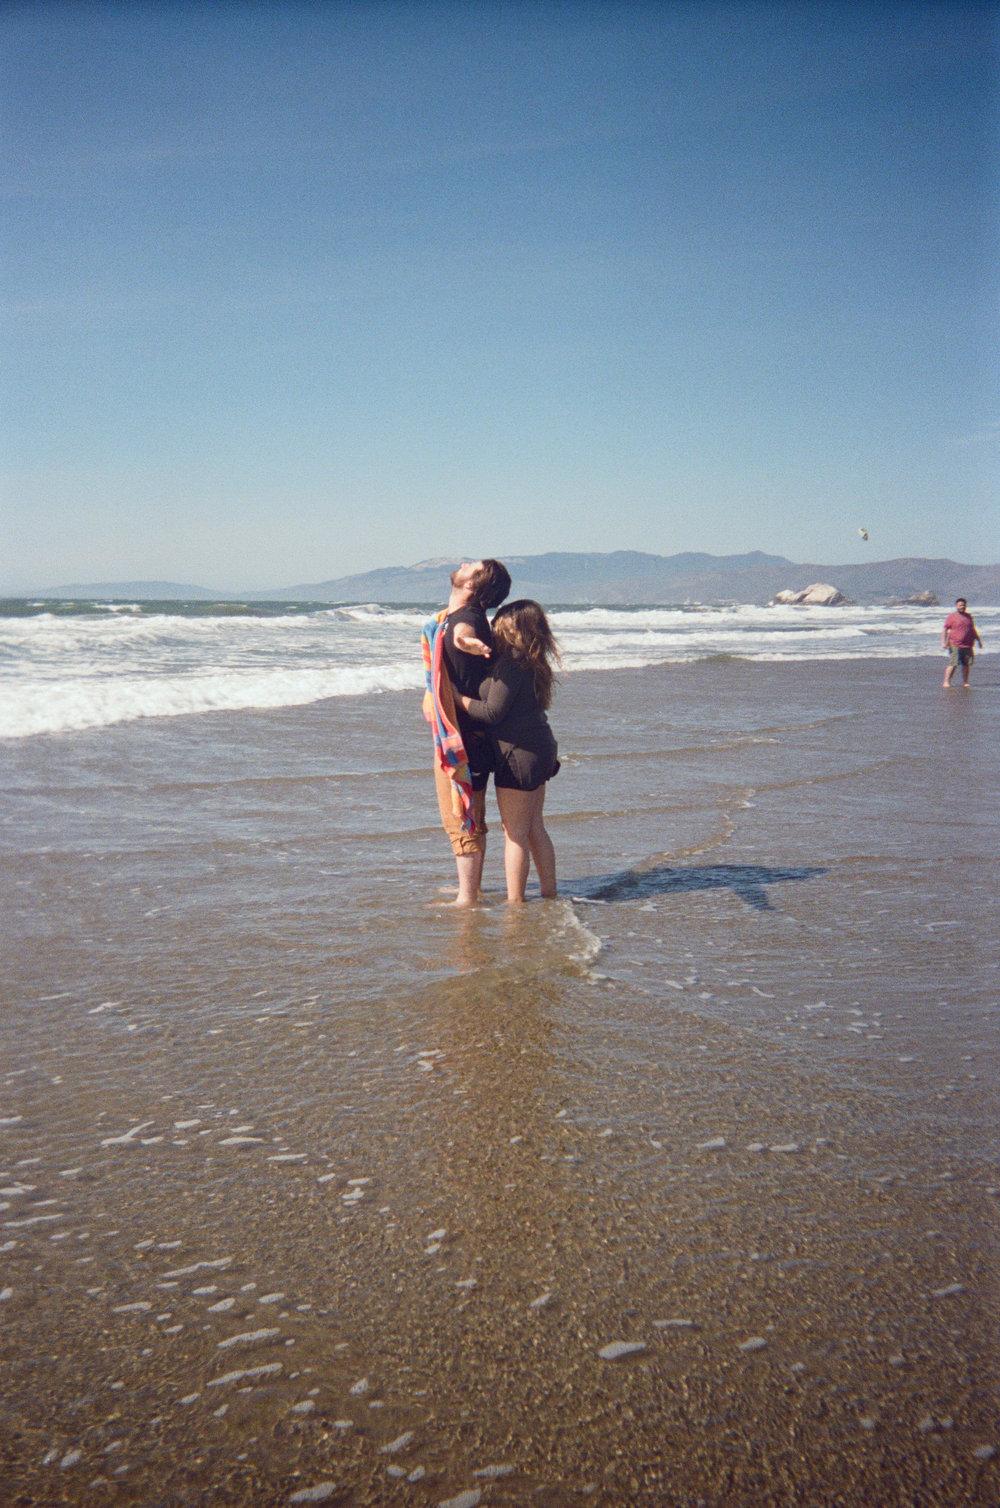 The windiest beach day.  San Francisco, CA.